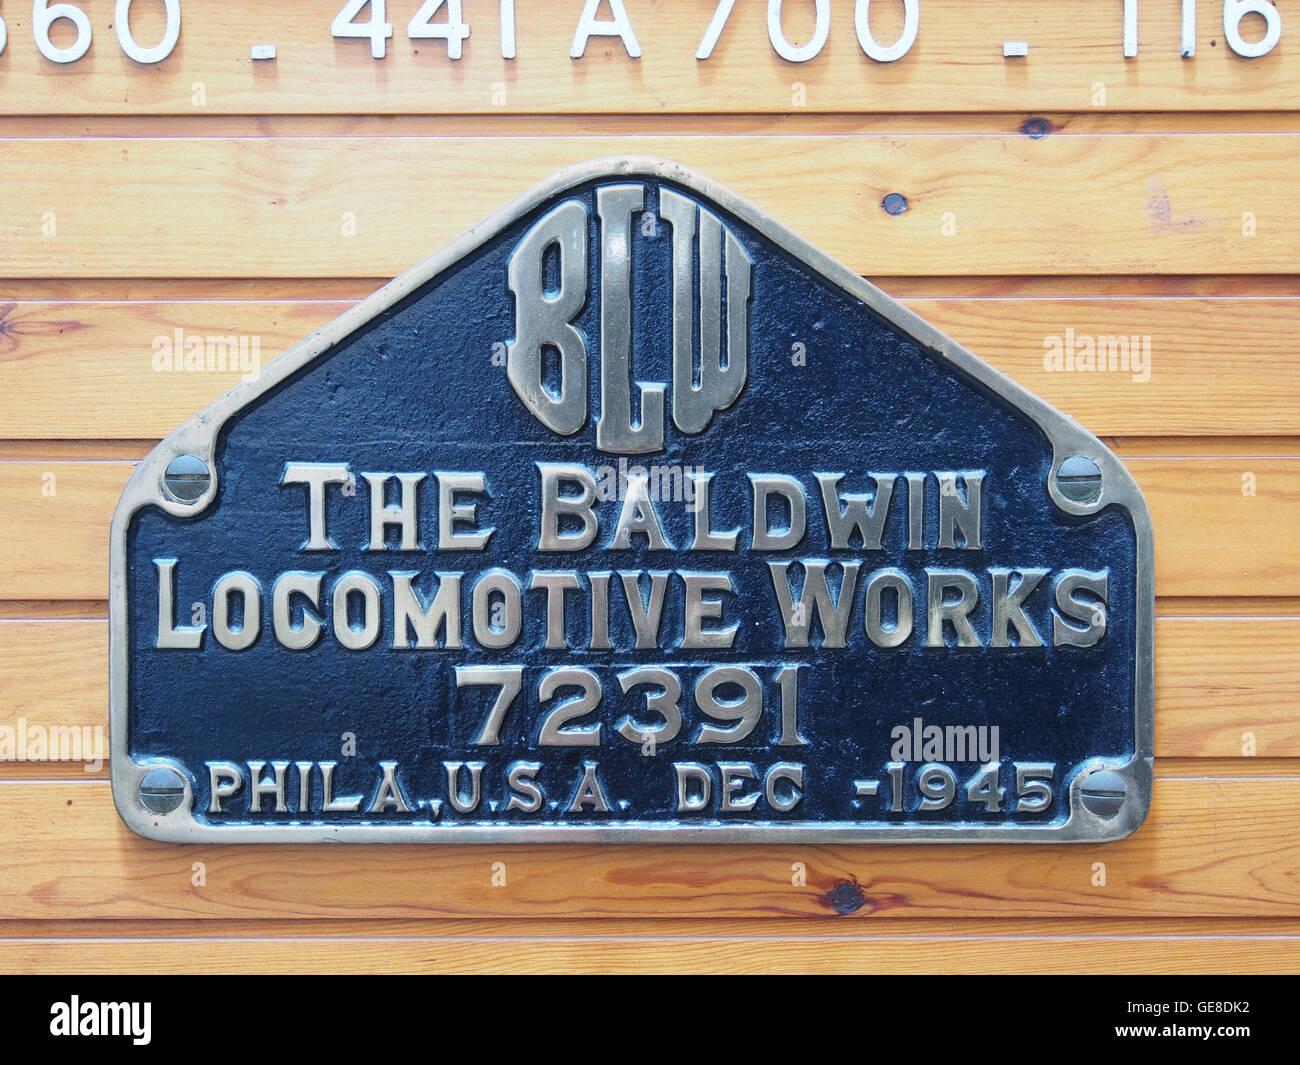 Plaque-de-constructeur The Baldwin Locomotive Works 72391, Phila USA Dec 1945 - Stock Image